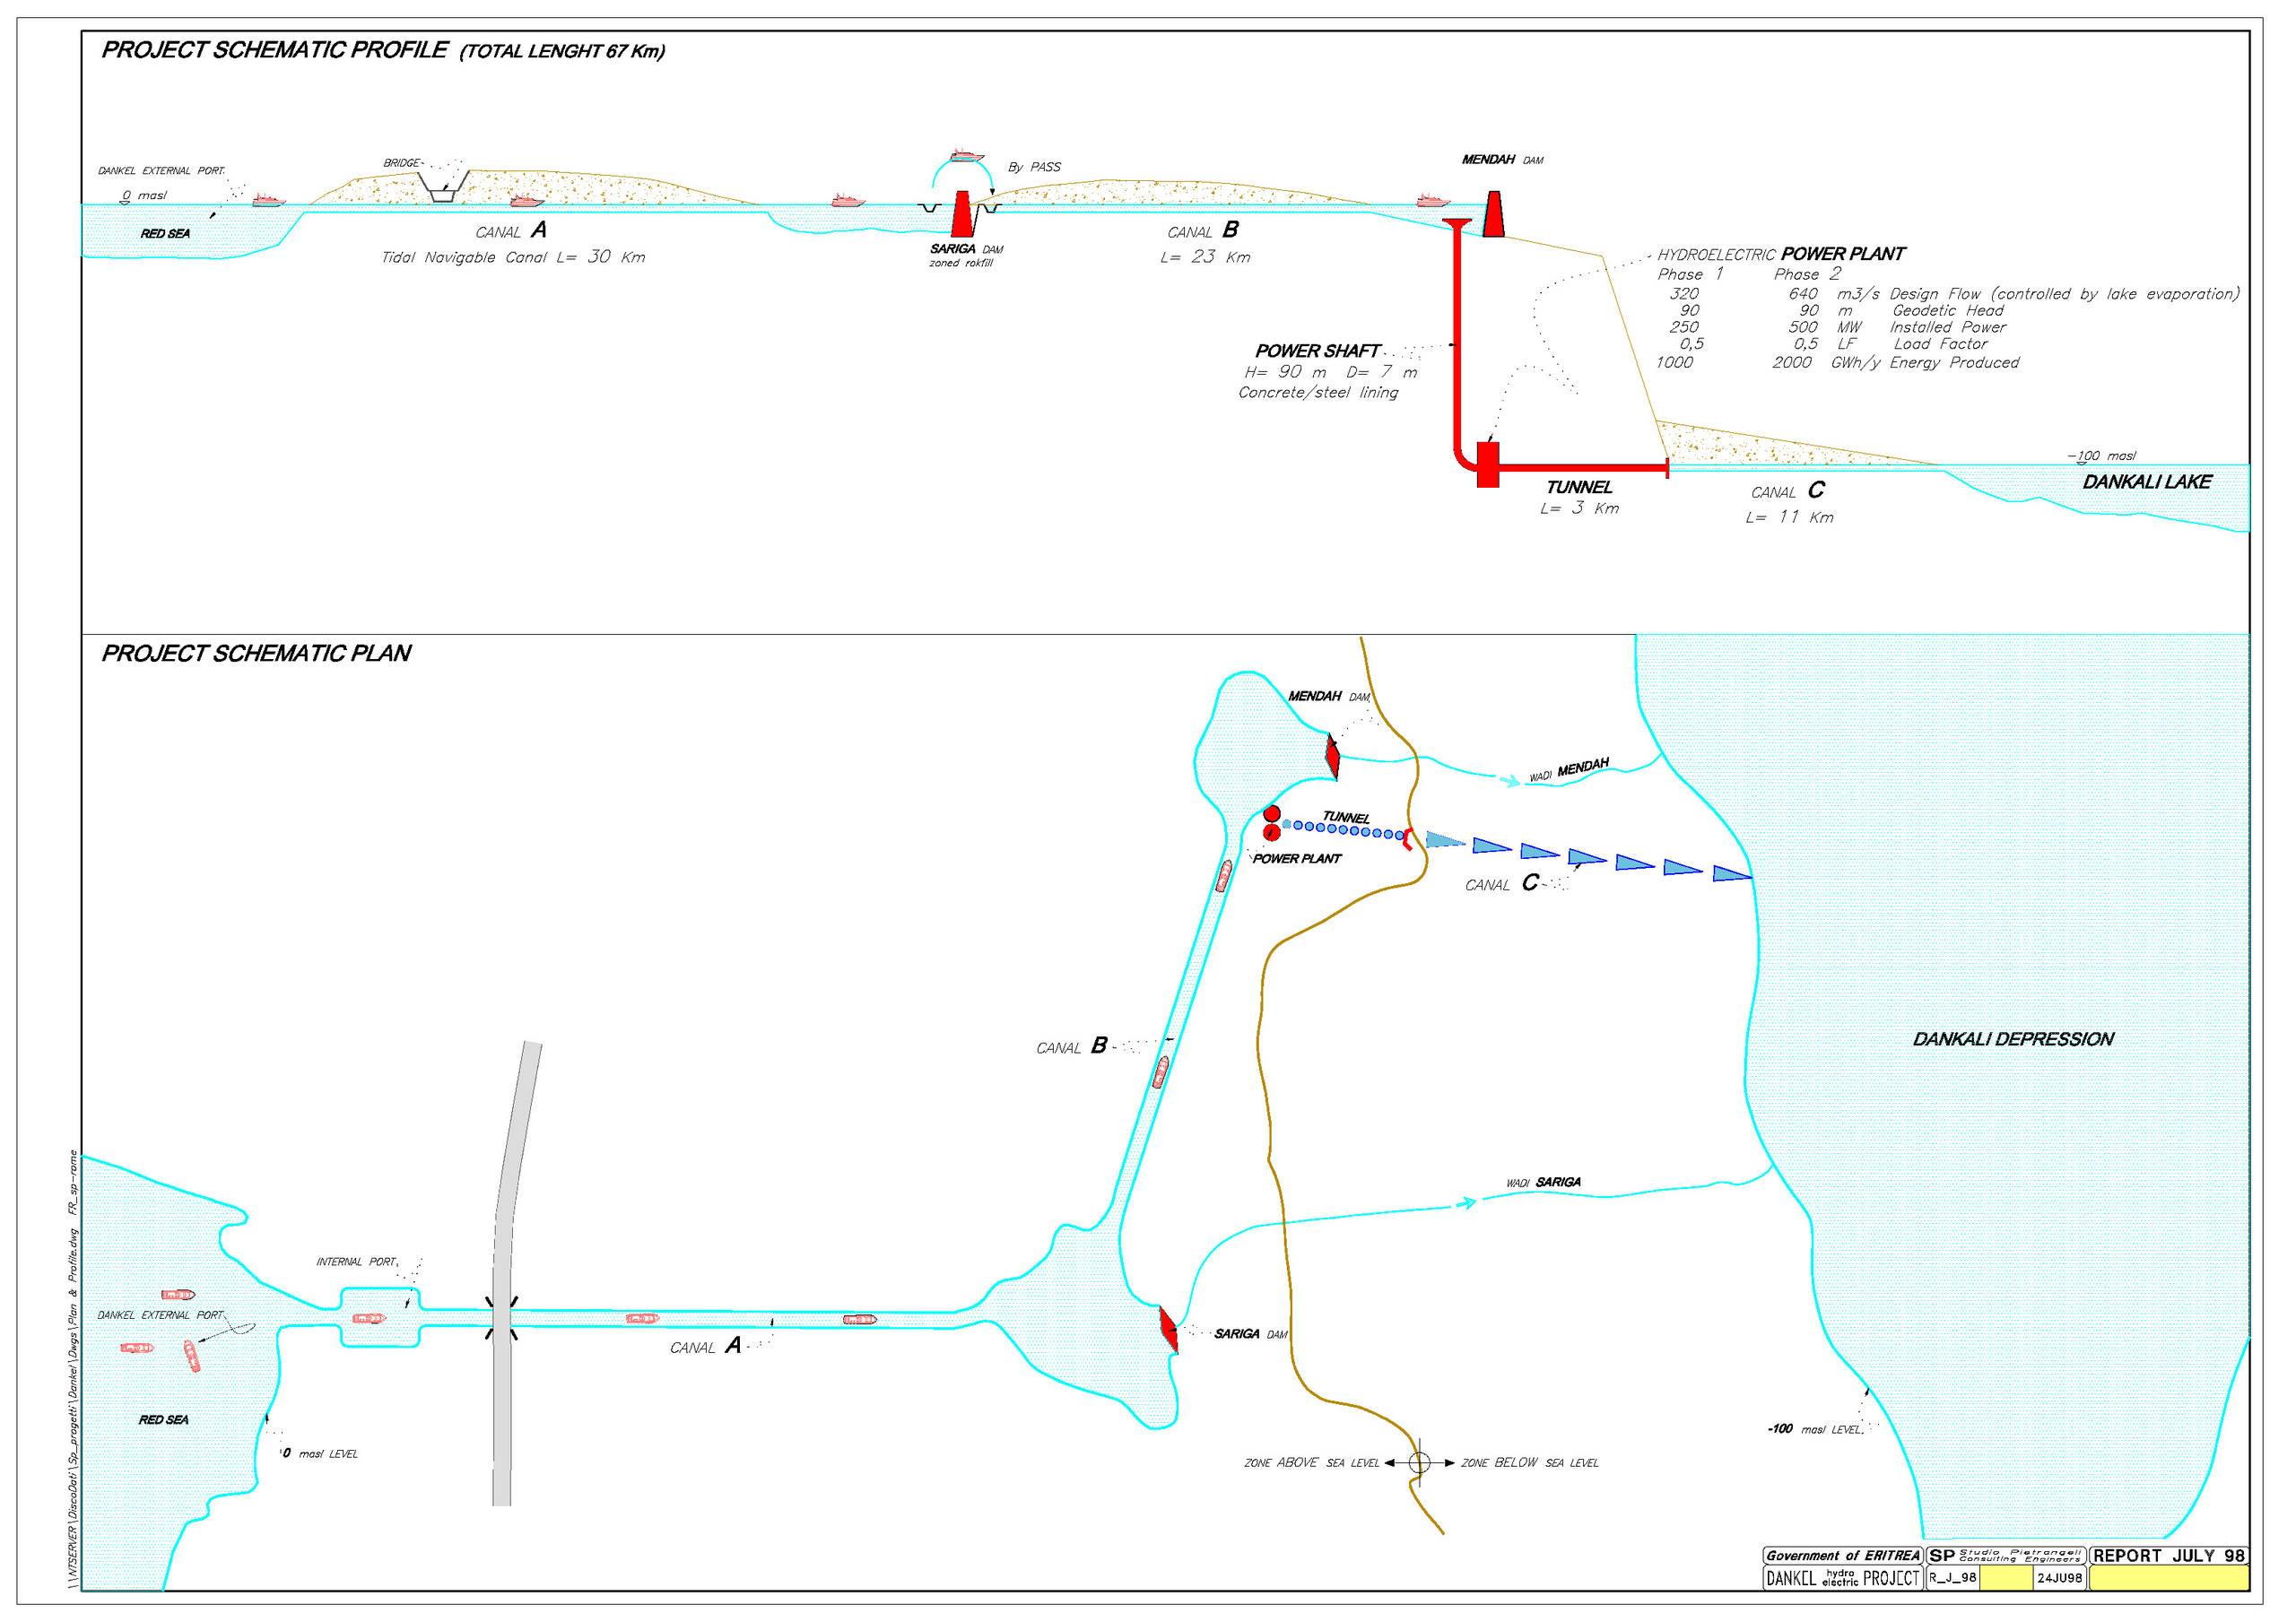 Hydroelectric Power Plant Diagram Pretty Hydro Underground Hydropower Dankali Depression Eritrea Studio Pietrangeli Water 2560x1809